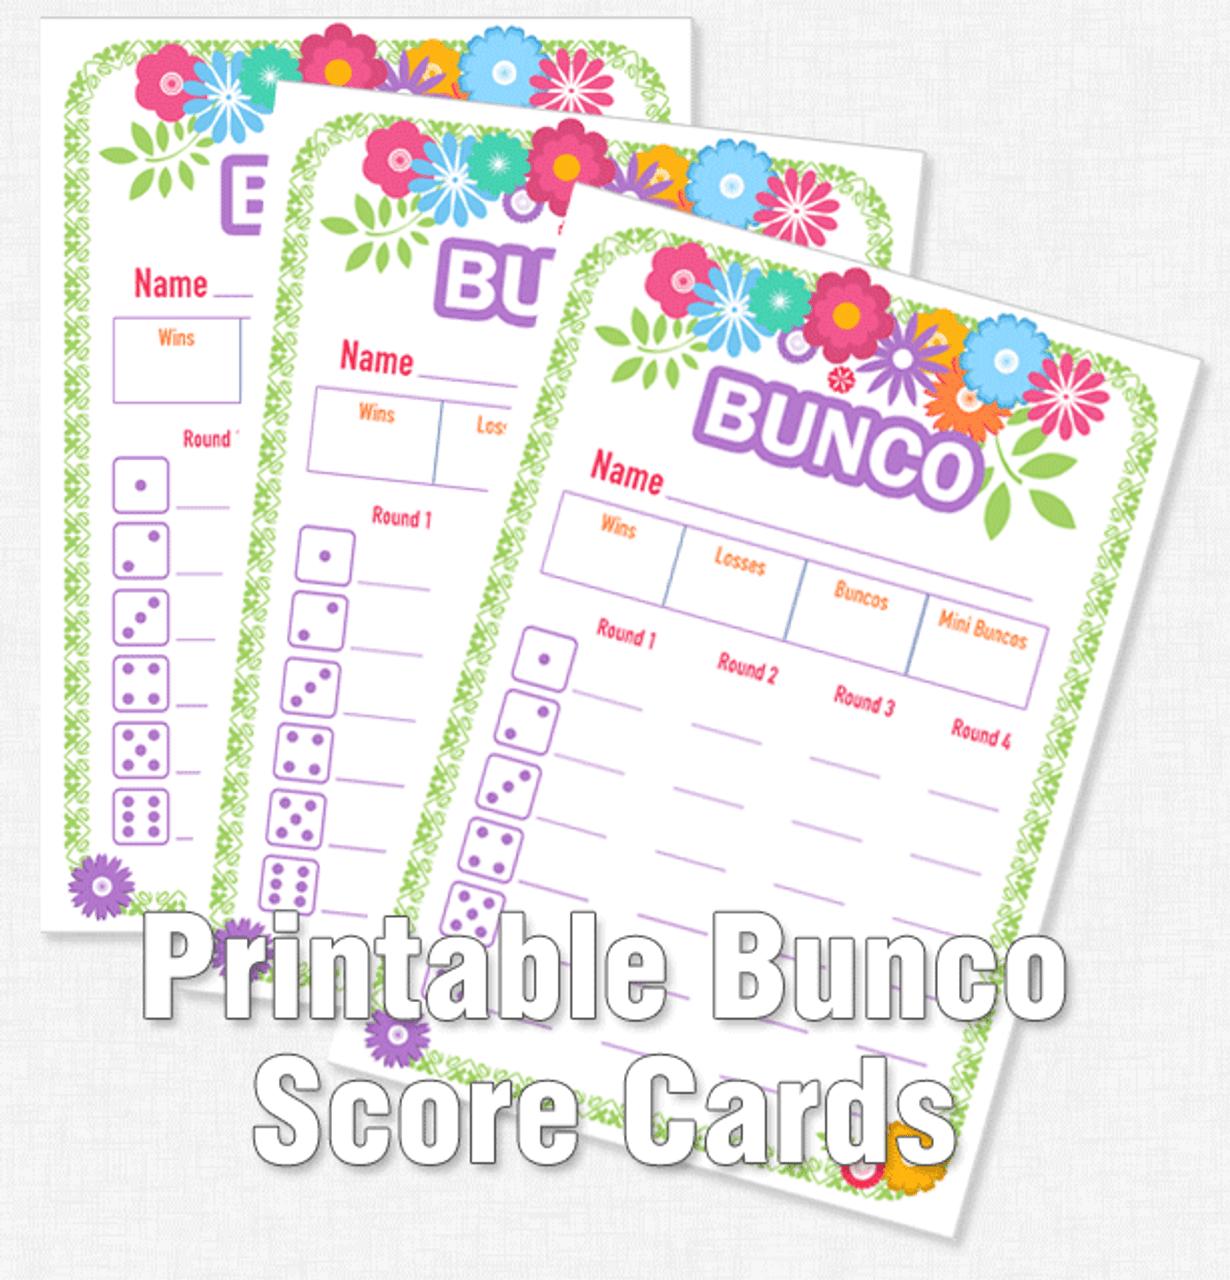 Printable Flower Bunco Score Cards - Dice Game Depot